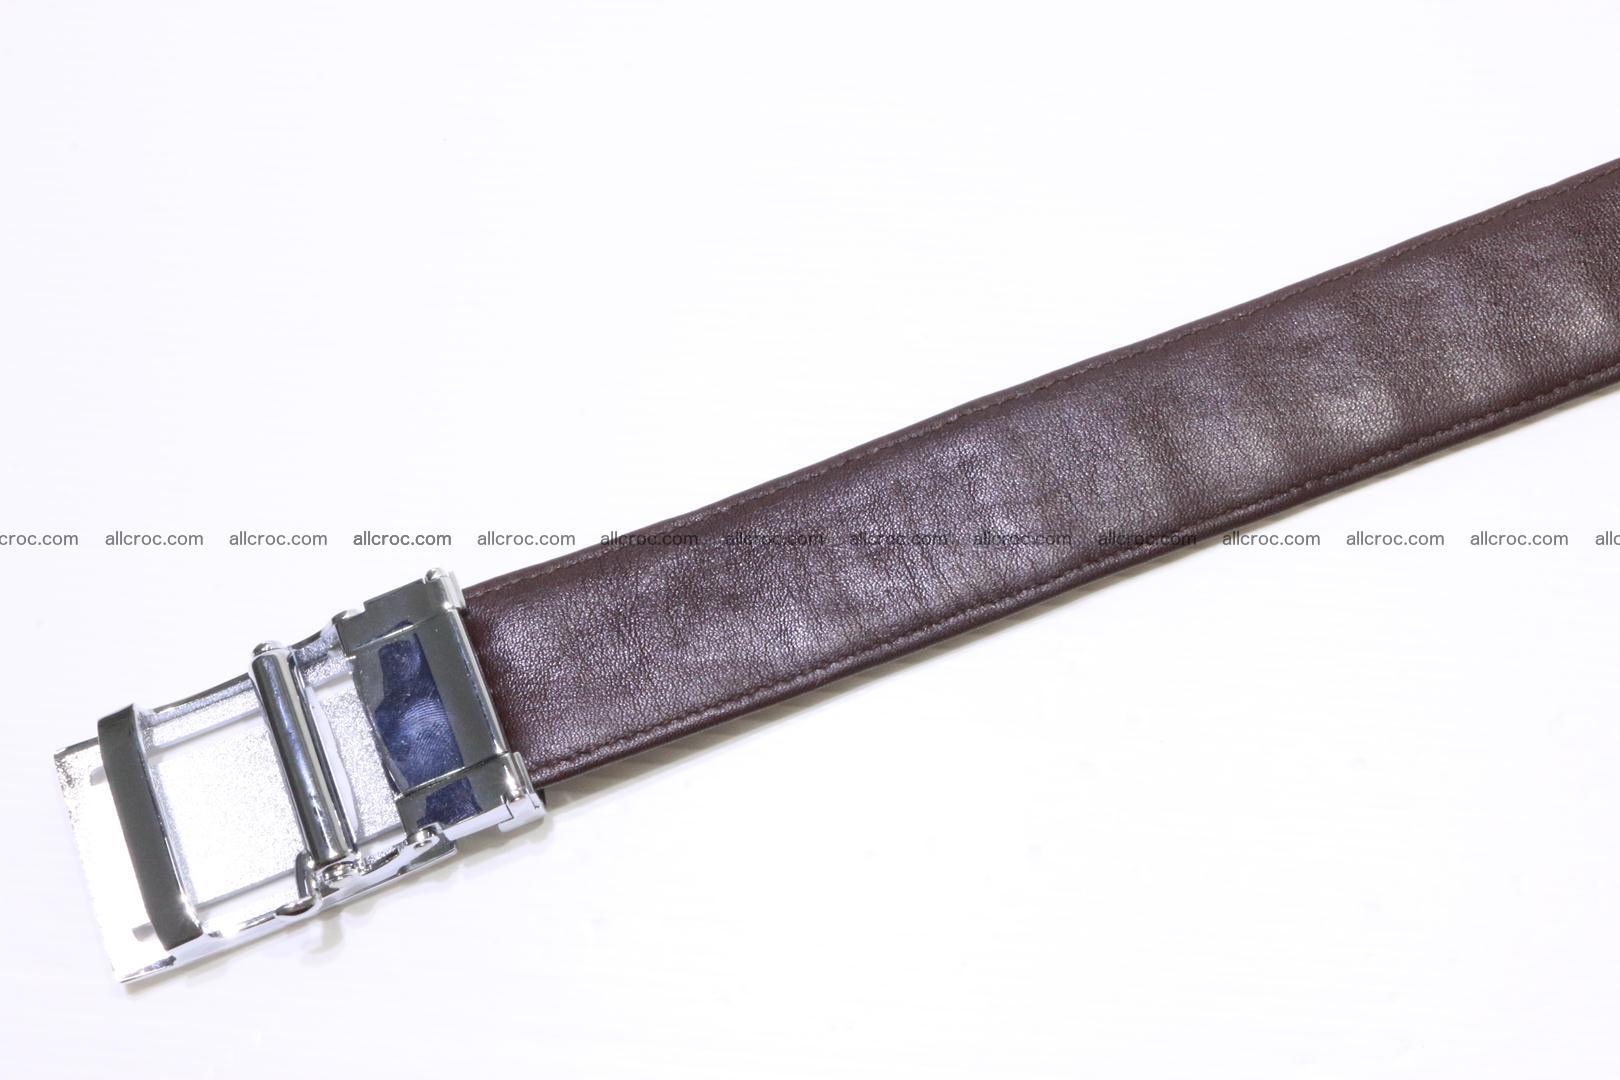 Genuine Crocodile leather double row Hornback belt 008 Foto 5